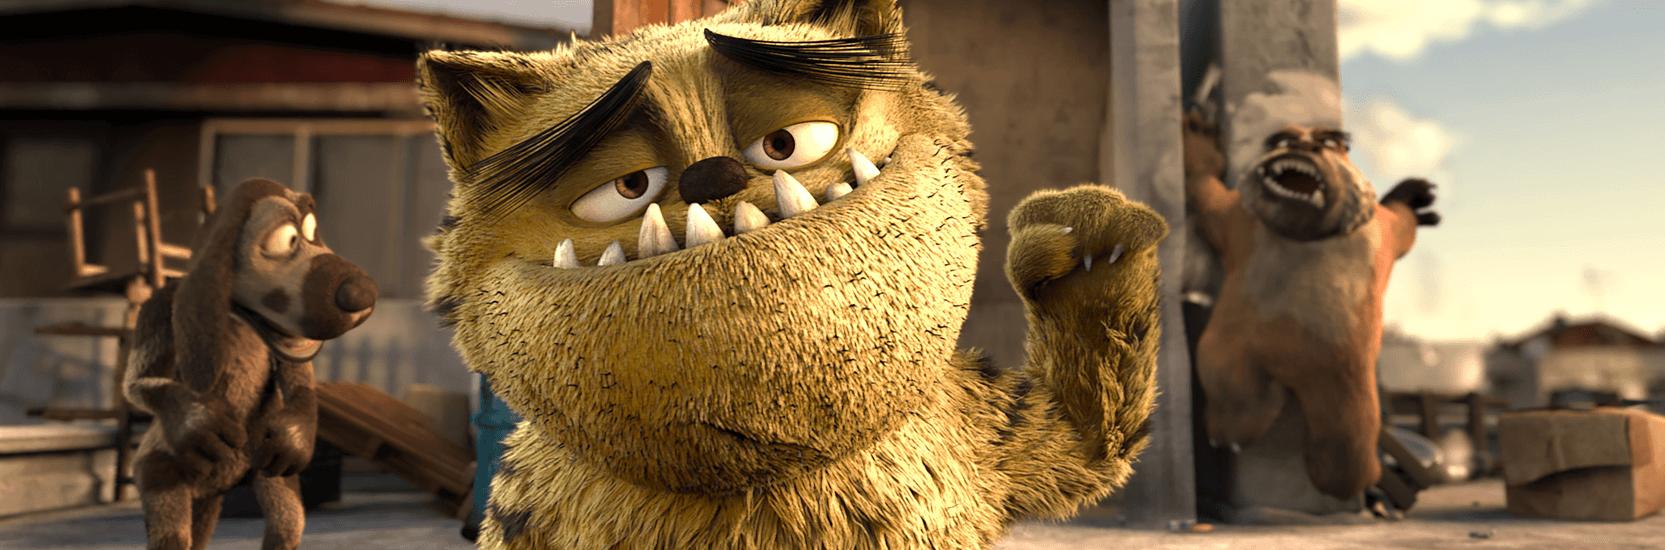 Critique – Bad Cat, Shero shot first !